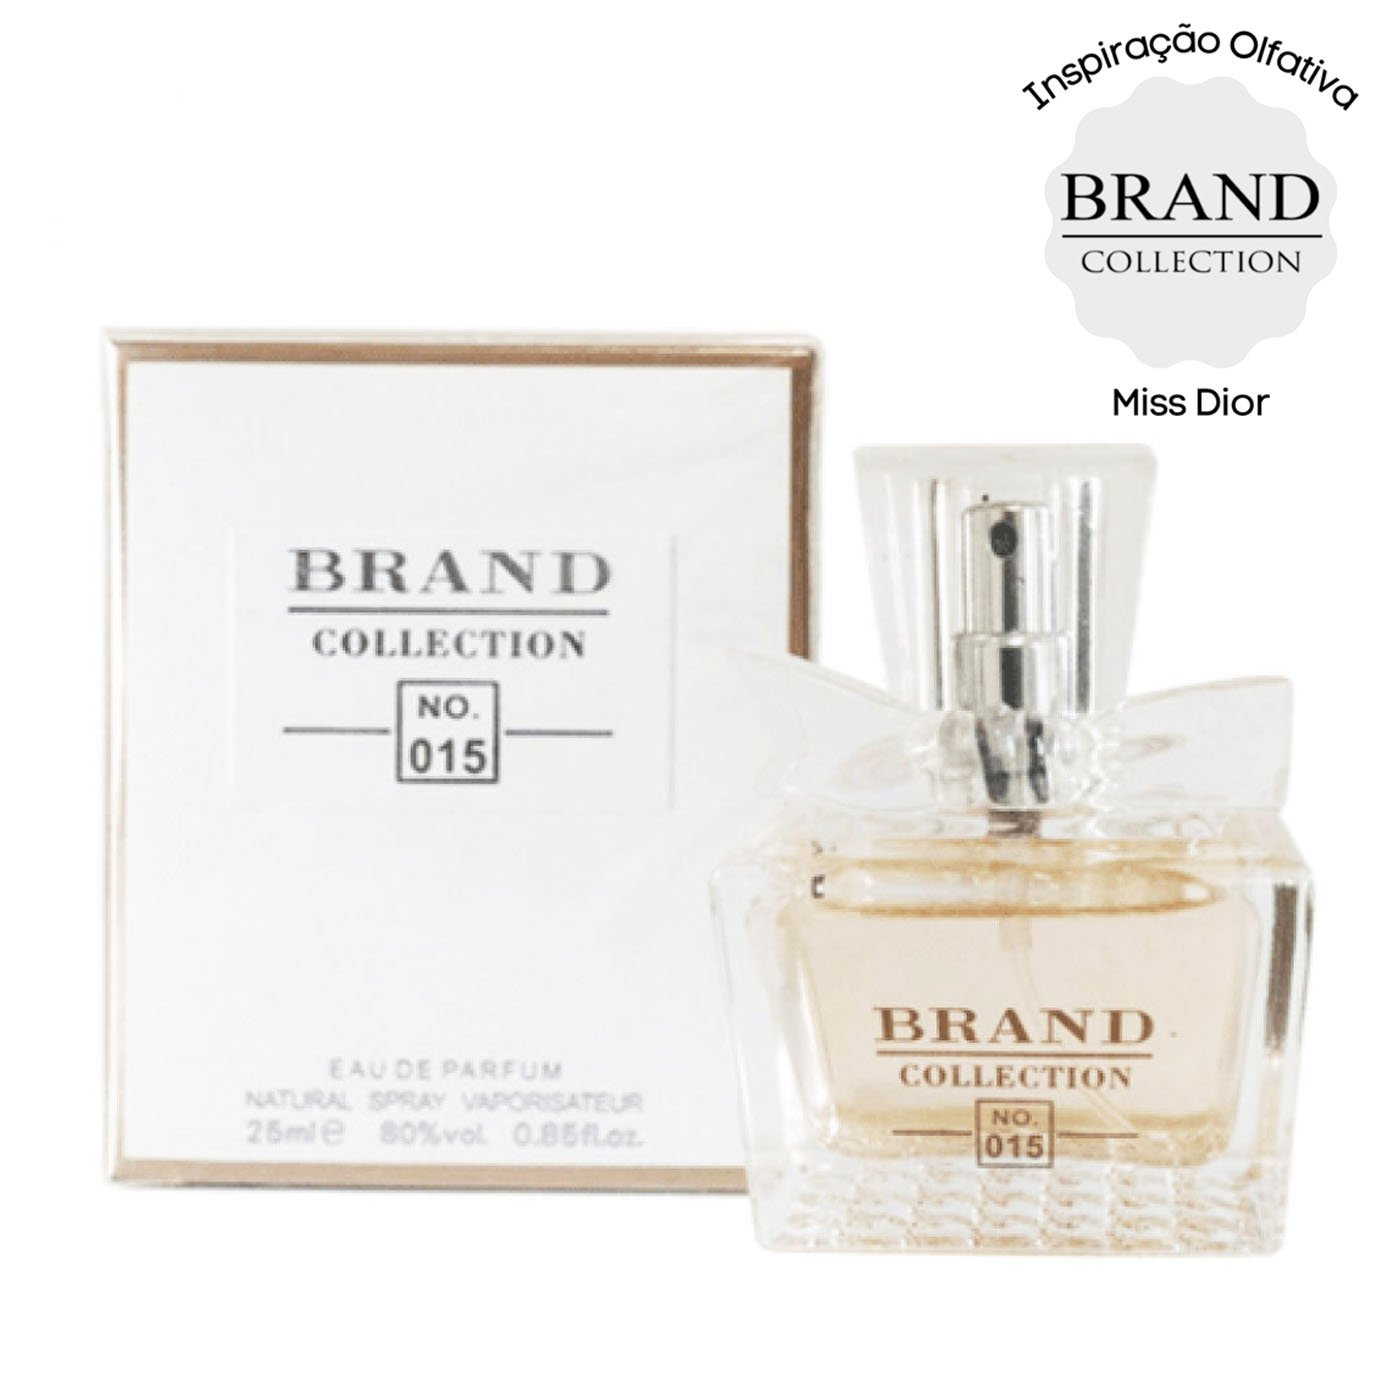 perfume brand collection 015 feminino 25 ml miss dior 51232 2000 203765 1